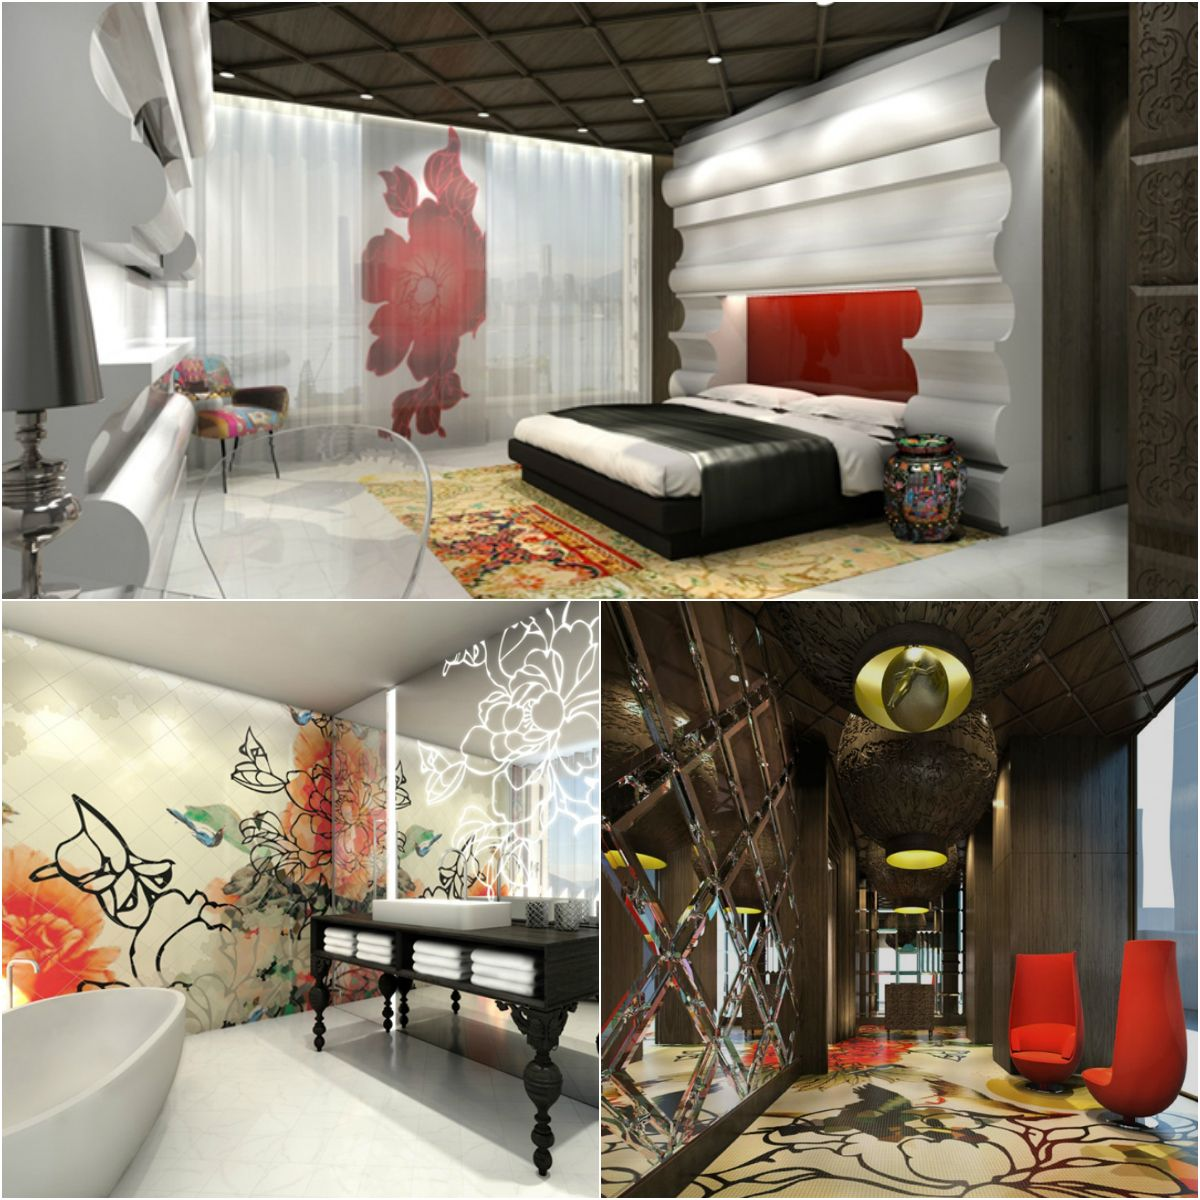 Extravagant Mira Retreat in Hong Kong | houseofdesign.info